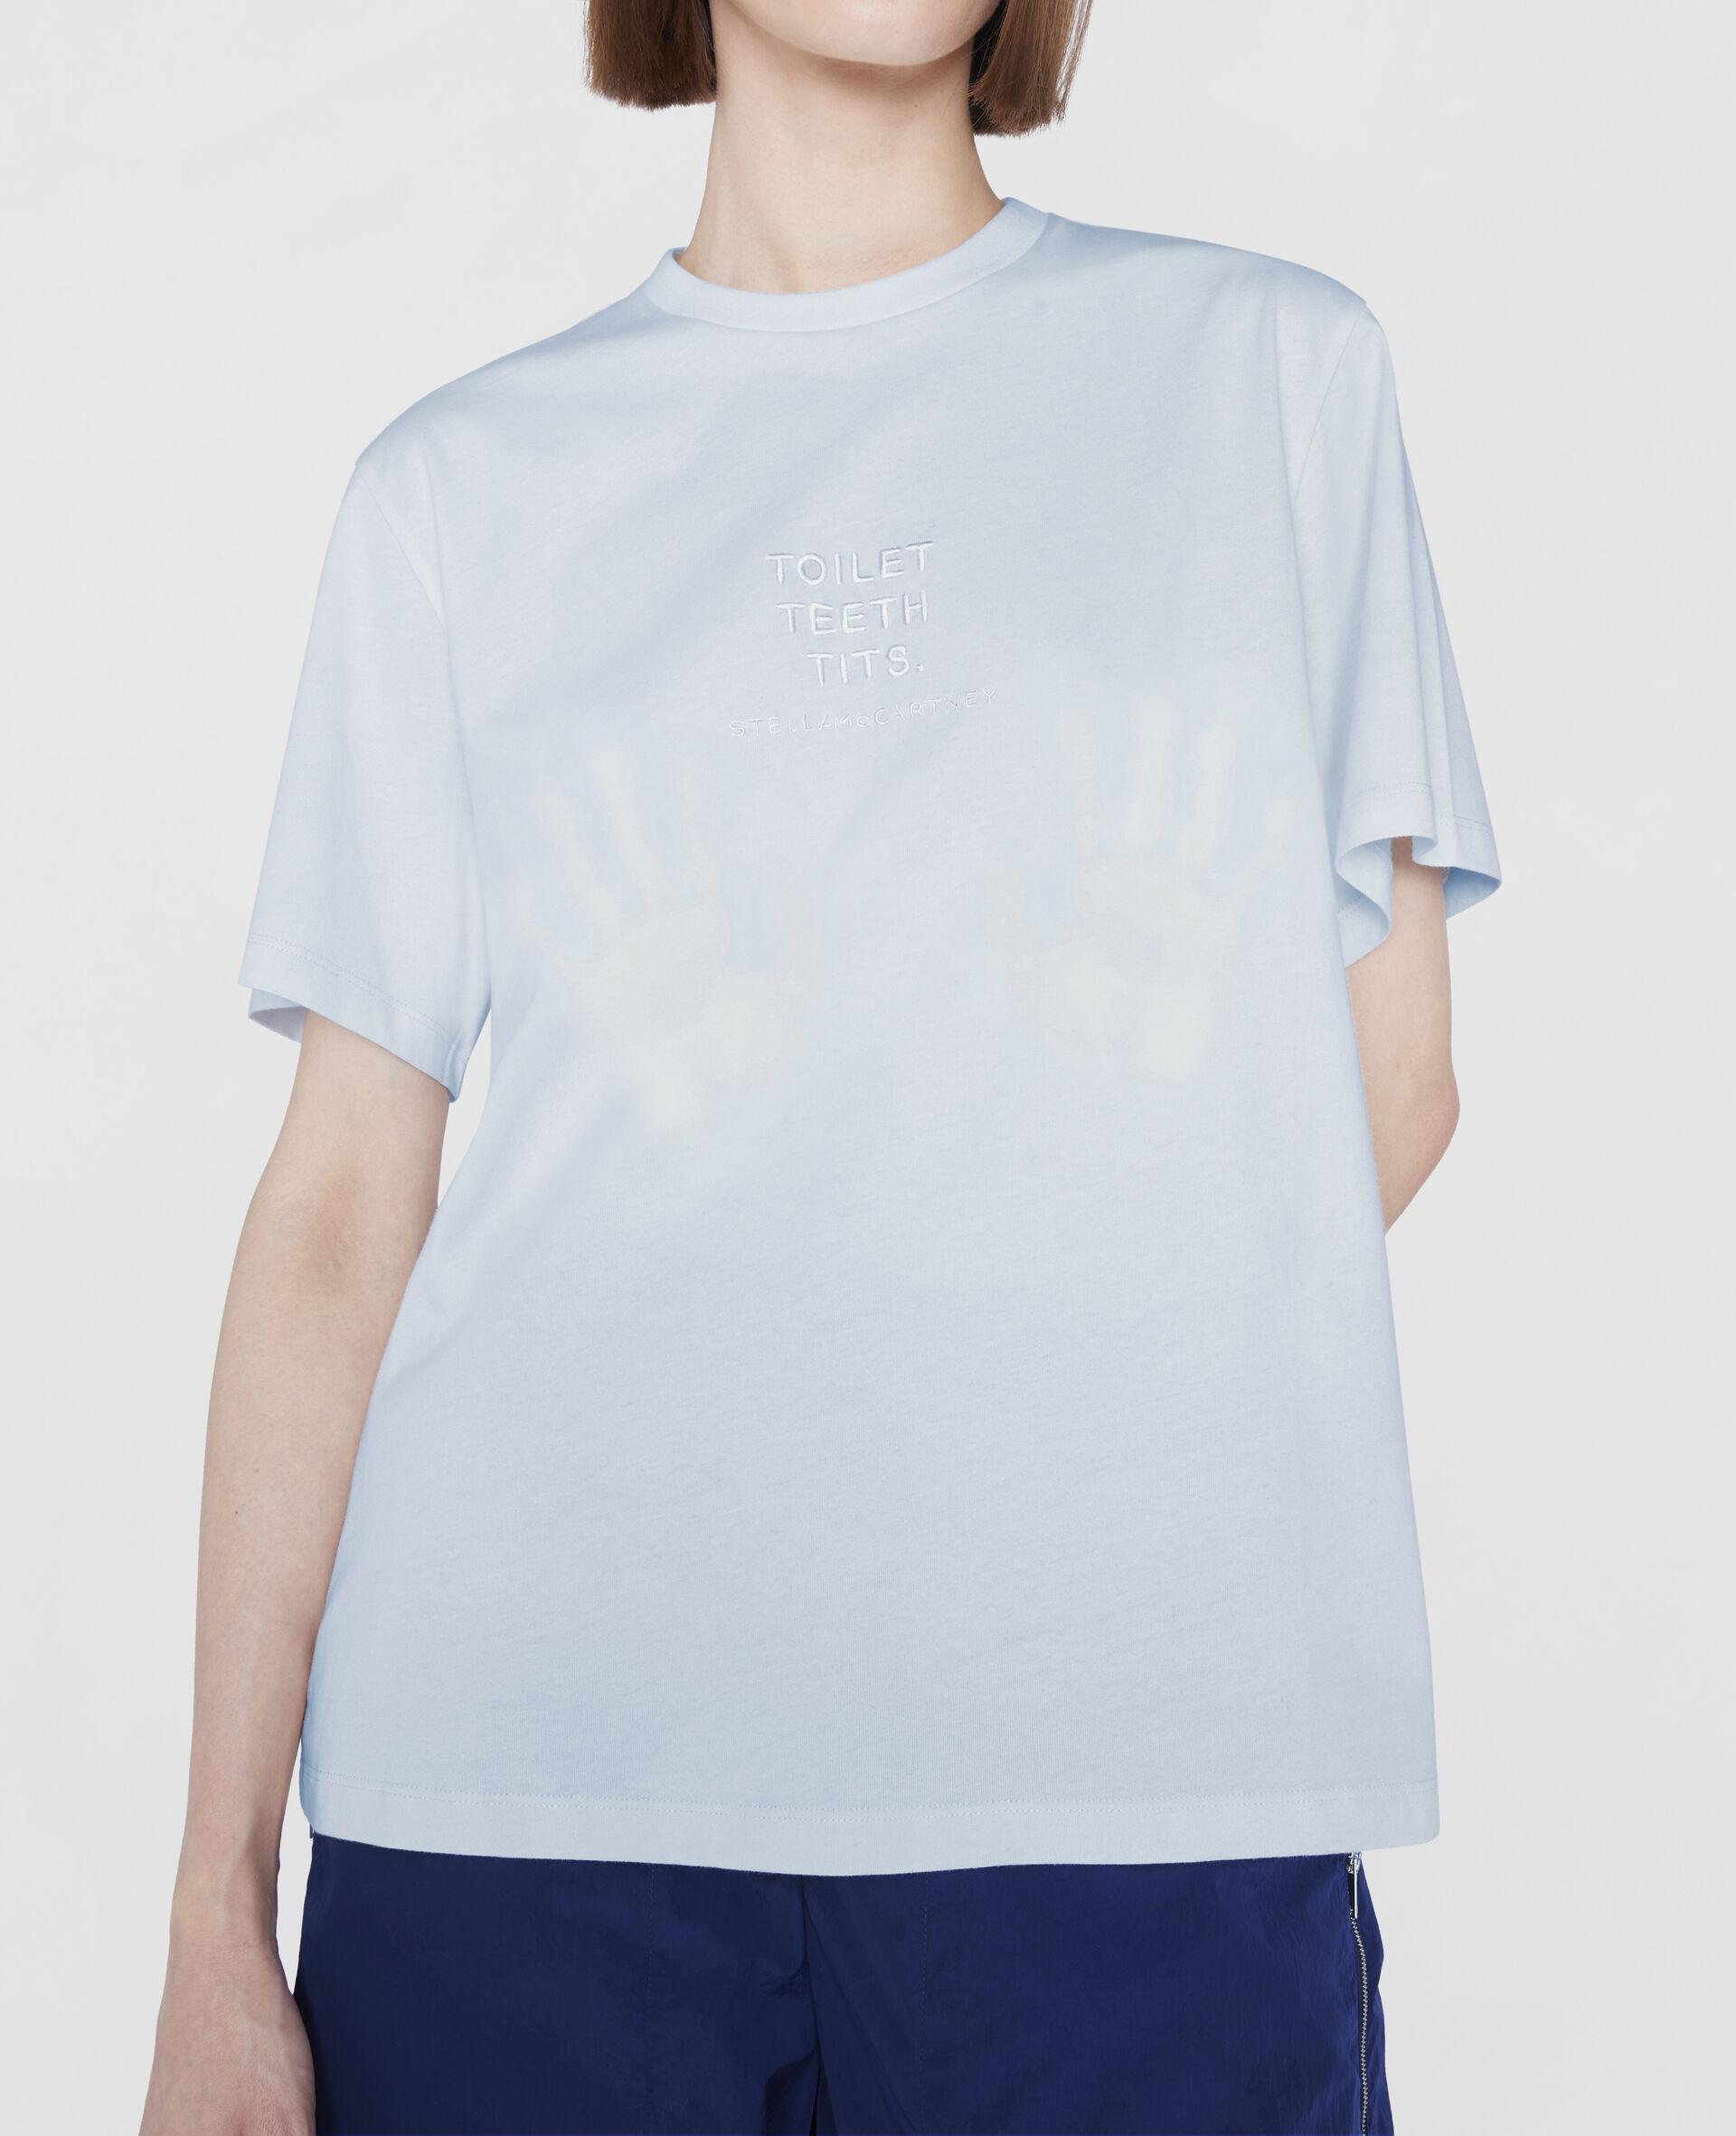 BCA 2021: Toilet, Tits, Teeth (TTT) T-shirt-Blue-large image number 3